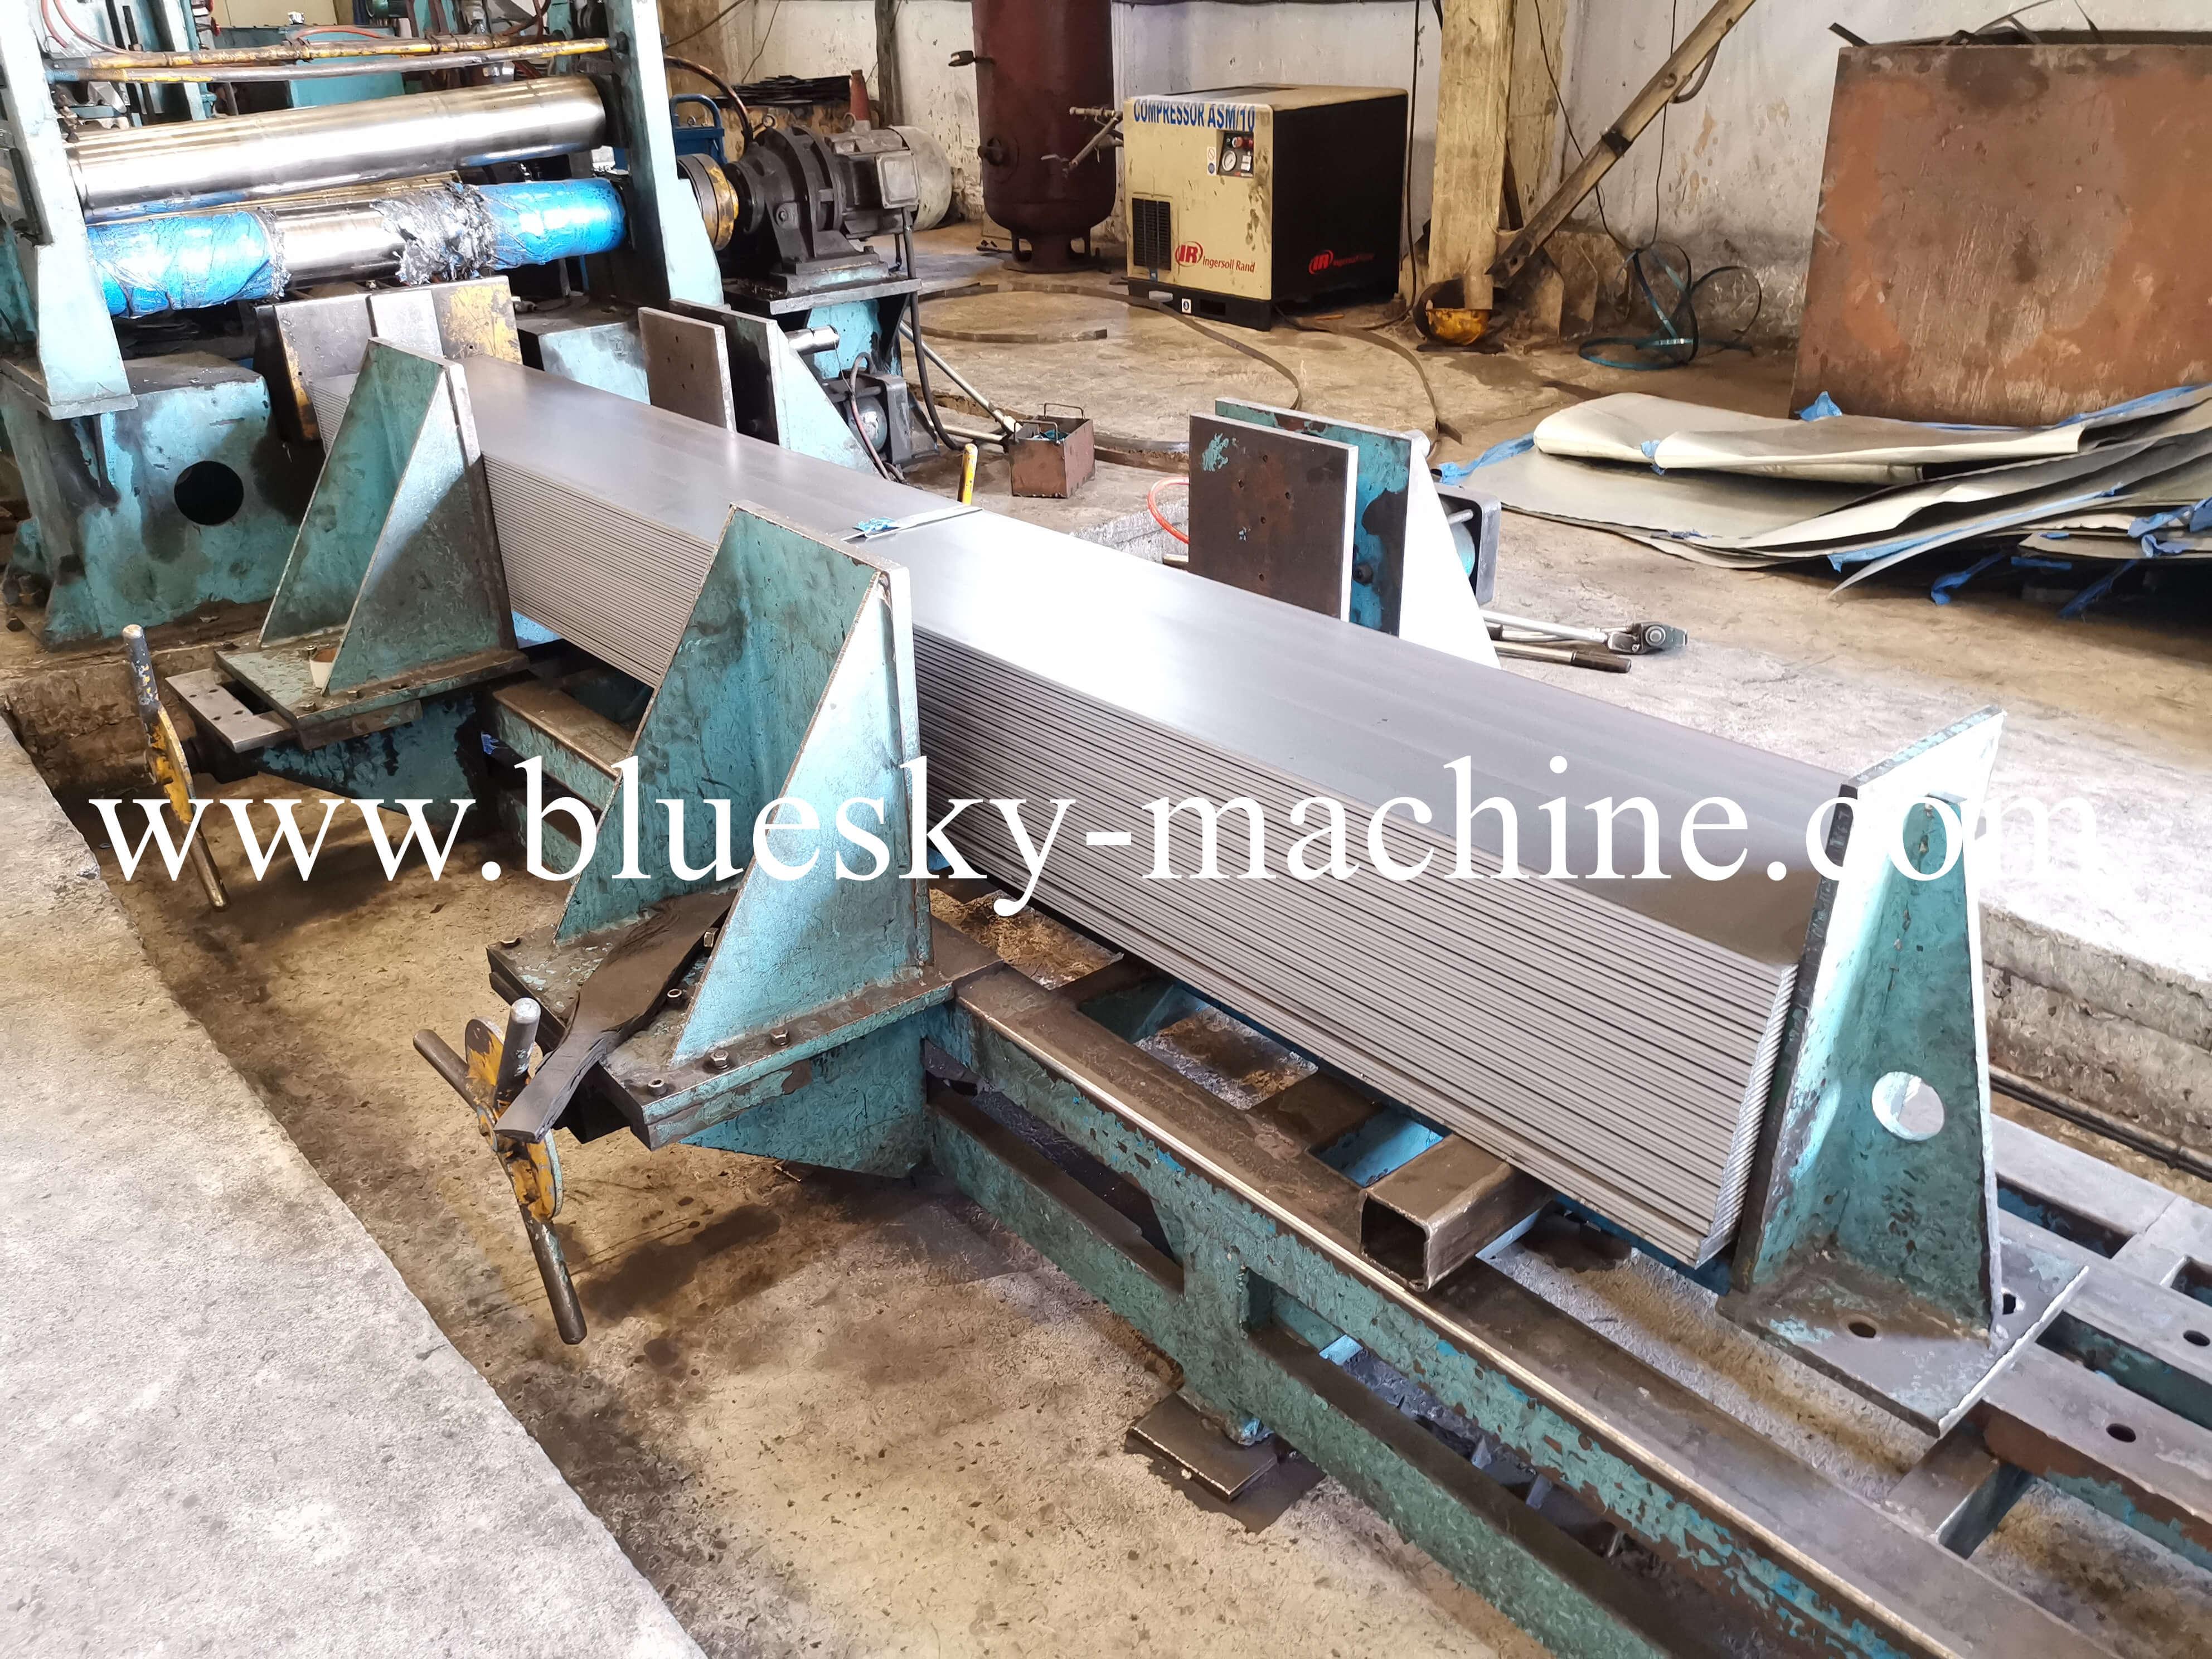 HR Sheet Coil Cutting Machine Unloading Work-Table